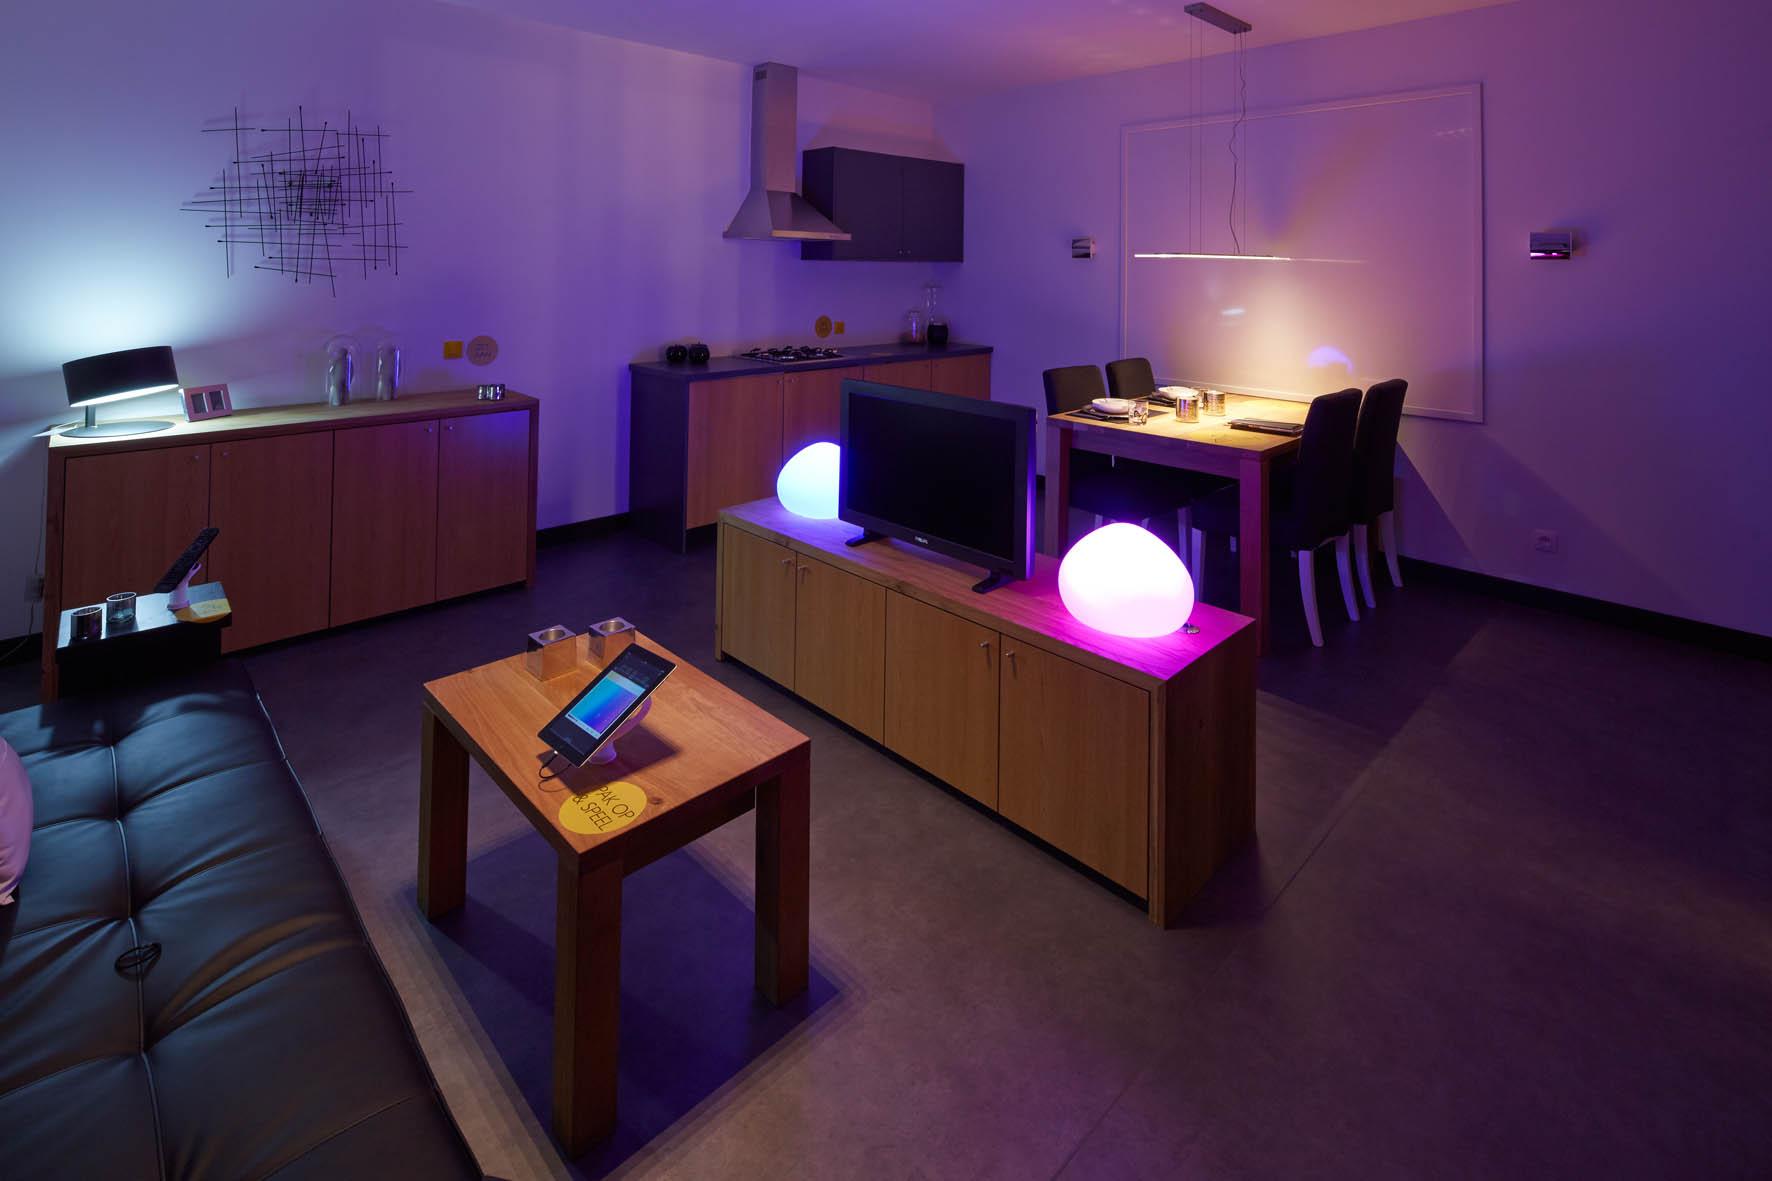 Philips interactive Light Gallery